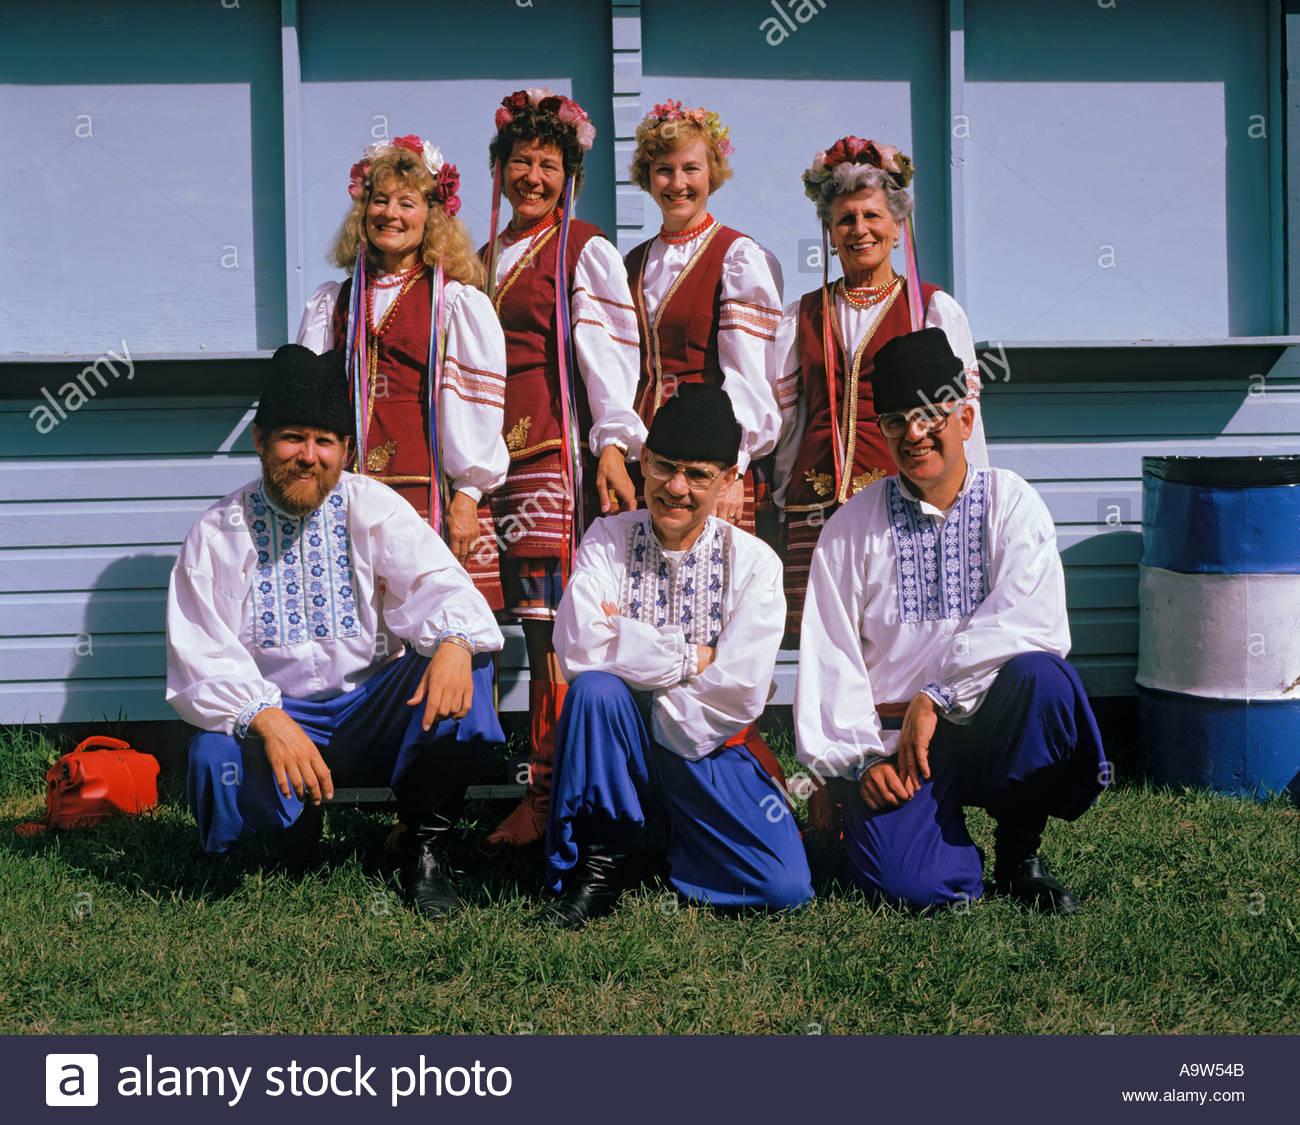 Ukrainian Dance troup Discovery Days festival in Dawson City Yukon territority Canada - Stock Image